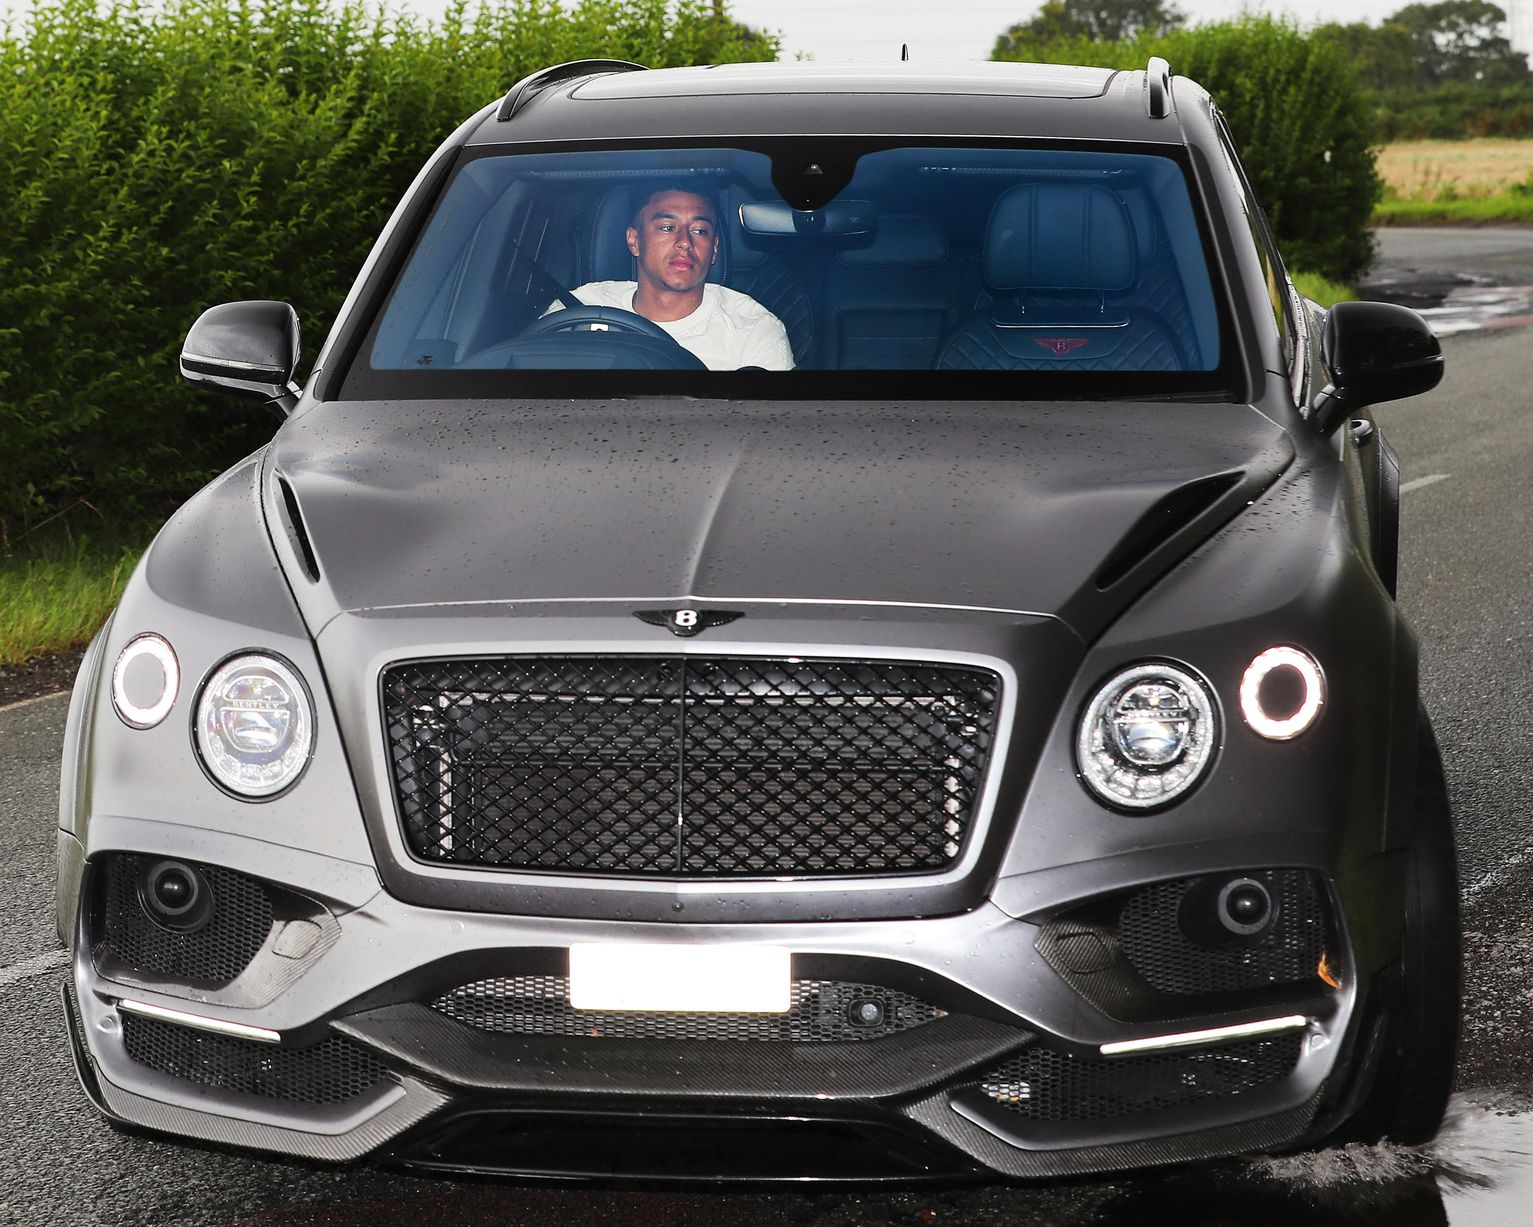 Alexis Sanchez arrives for Manchester United training as Inter Milan make transfer enquiry - Bóng Đá